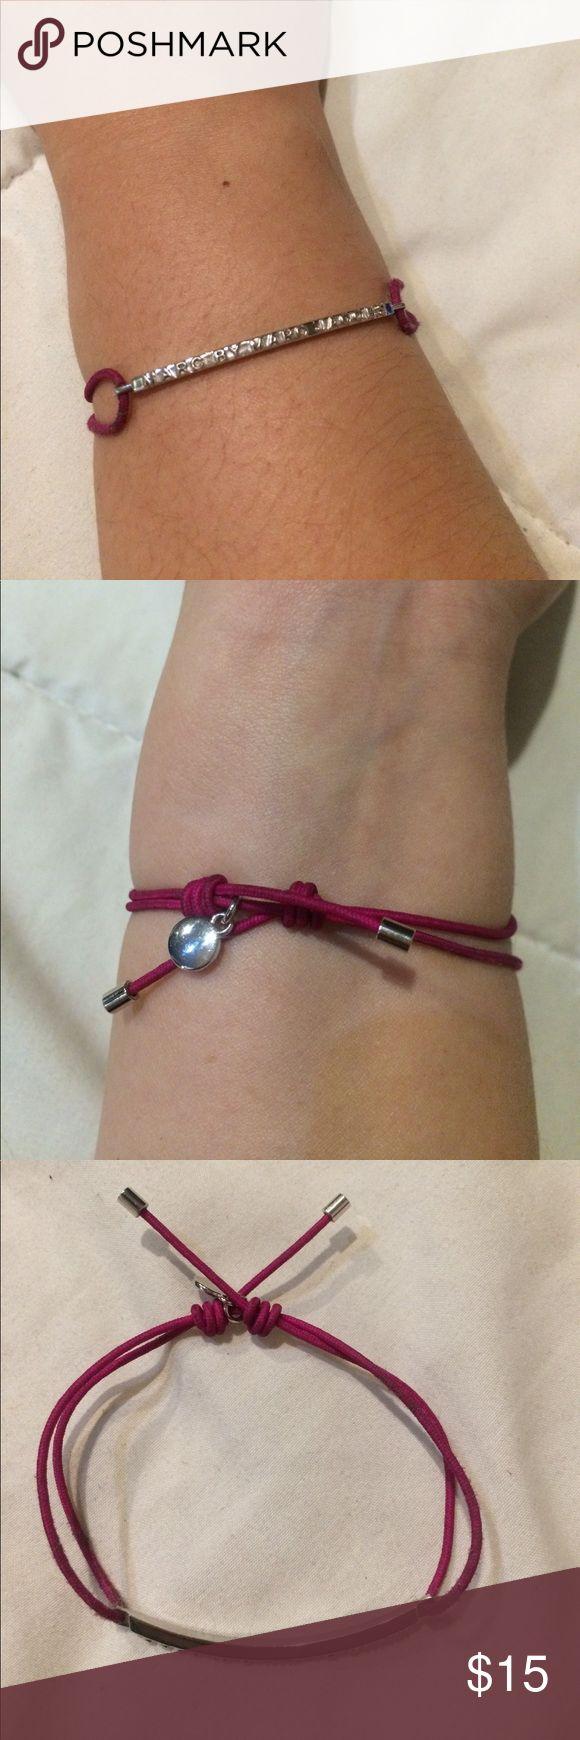 Marc Jacobs bracelet Marc Jacobs bracelet / adjustable Marc By Marc Jacobs Jewelry Bracelets